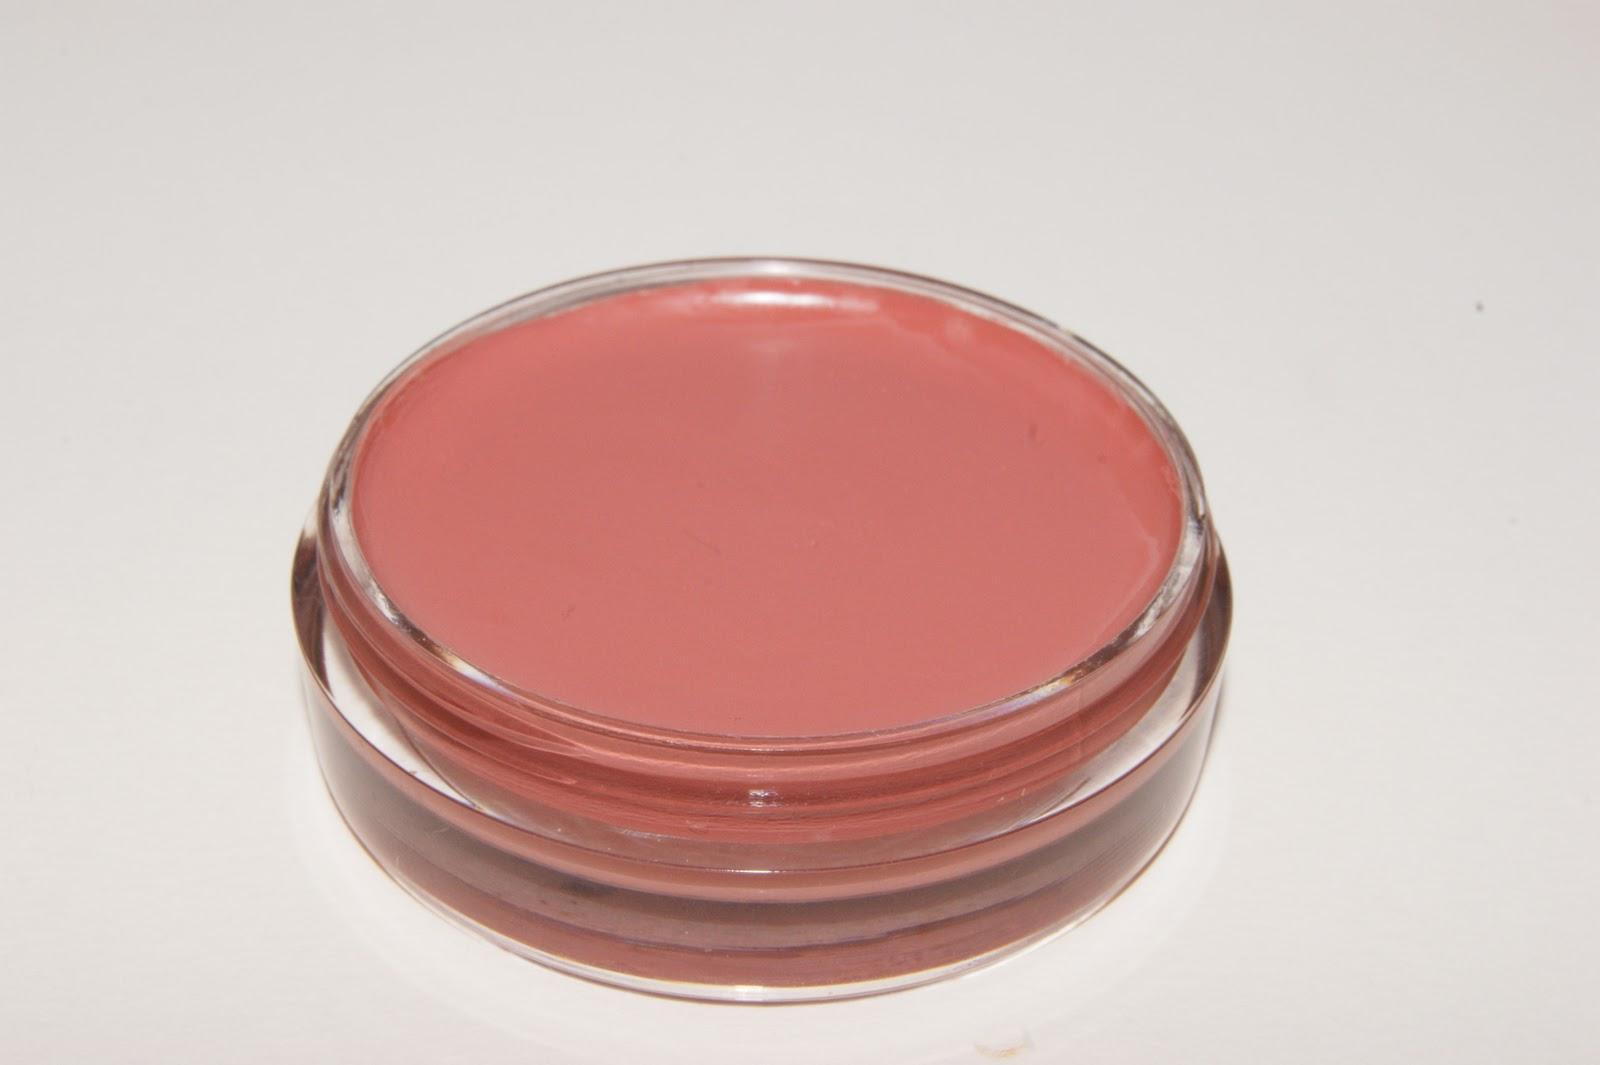 Bobbi brown pot rouge in powder pink review - Pot rouge exterieur ...